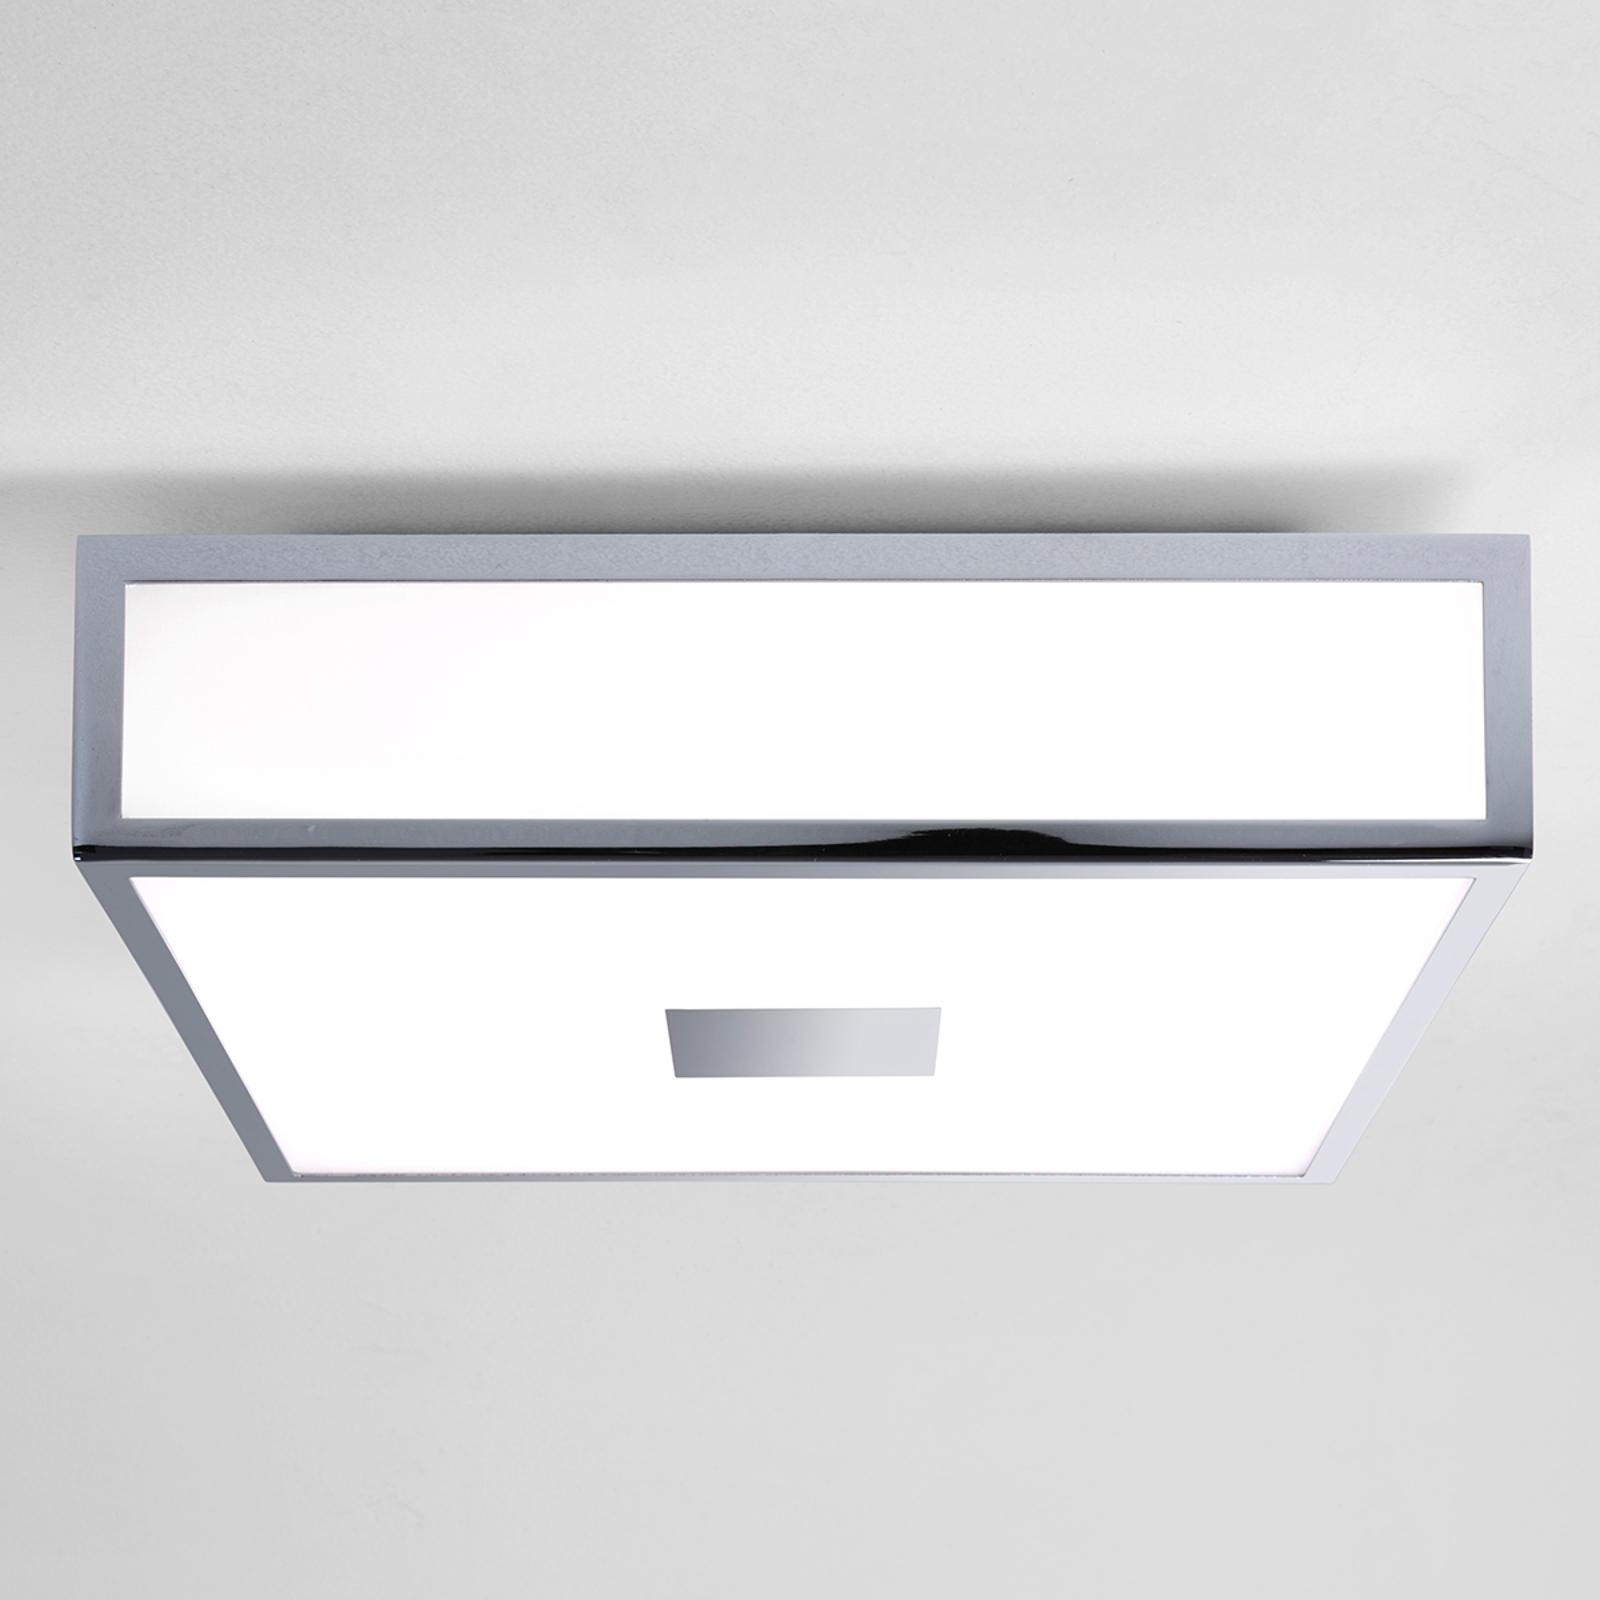 Hoekige LED plafondlamp Mashiko met IP44